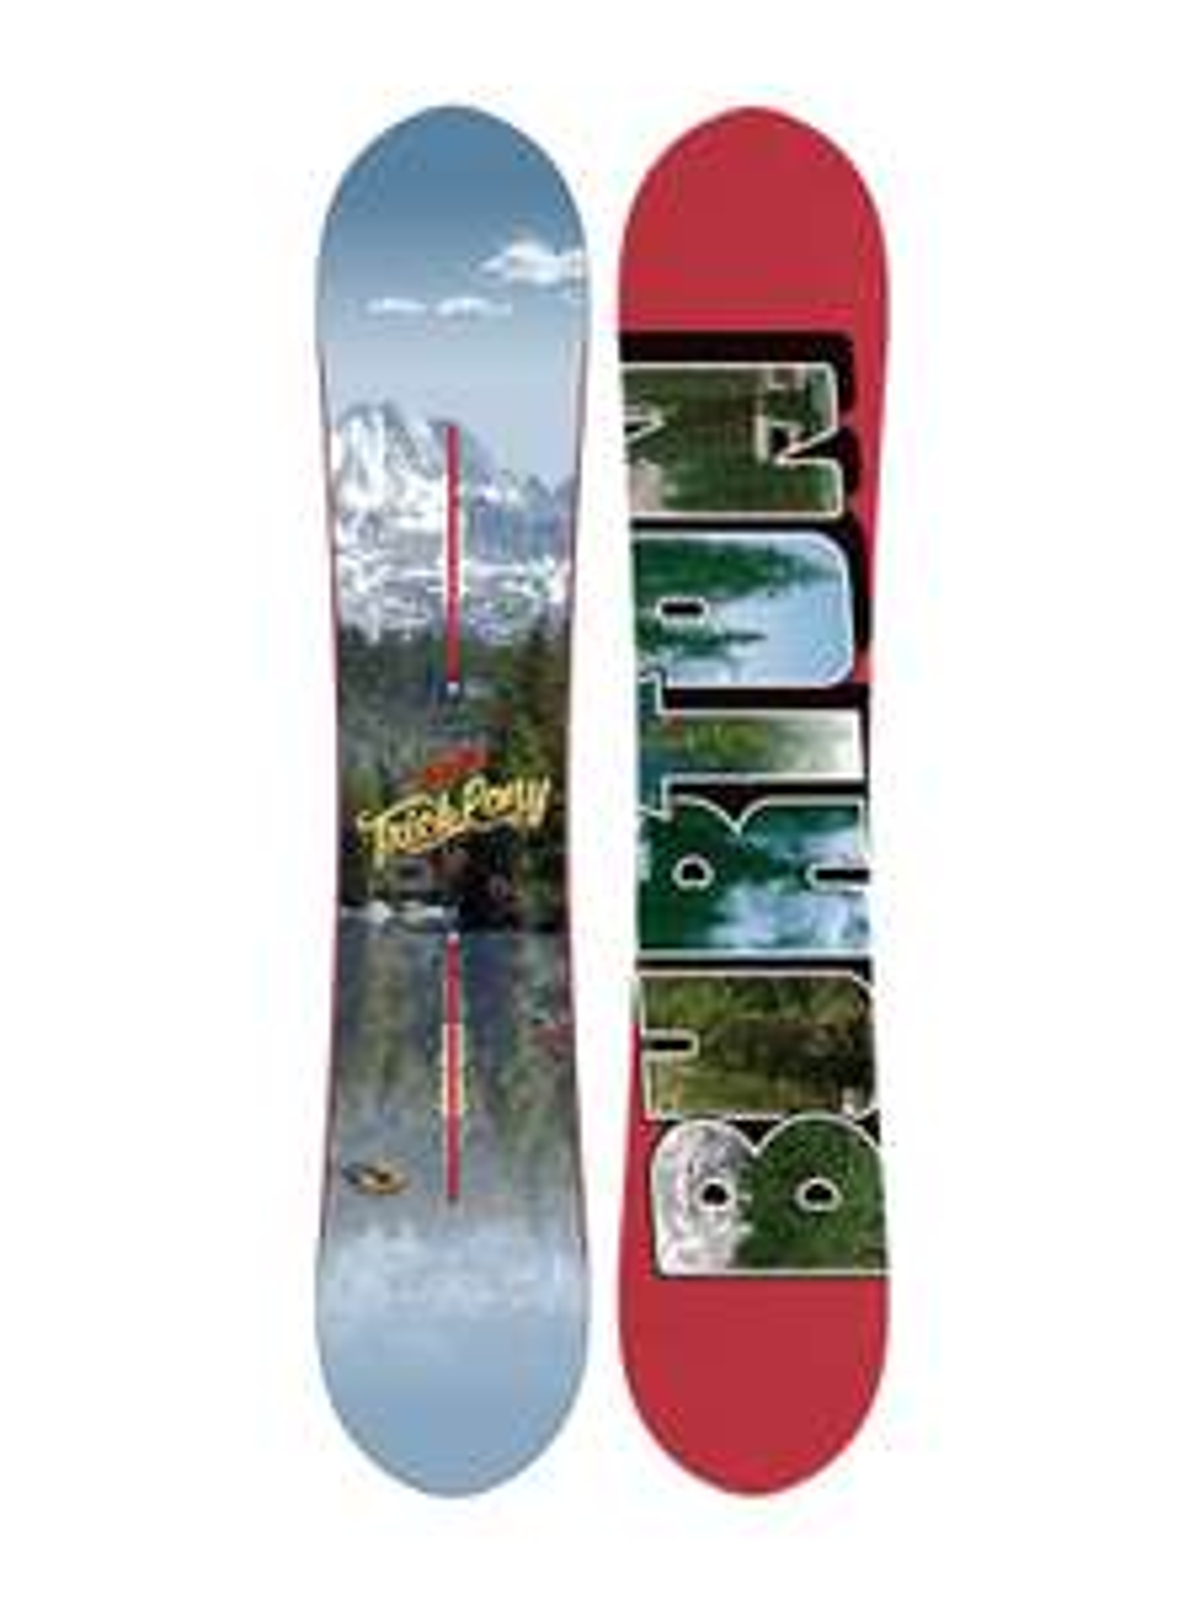 Snowboard - Burton Trick Pony (B-Ware/2nd) 2015 - 158cm